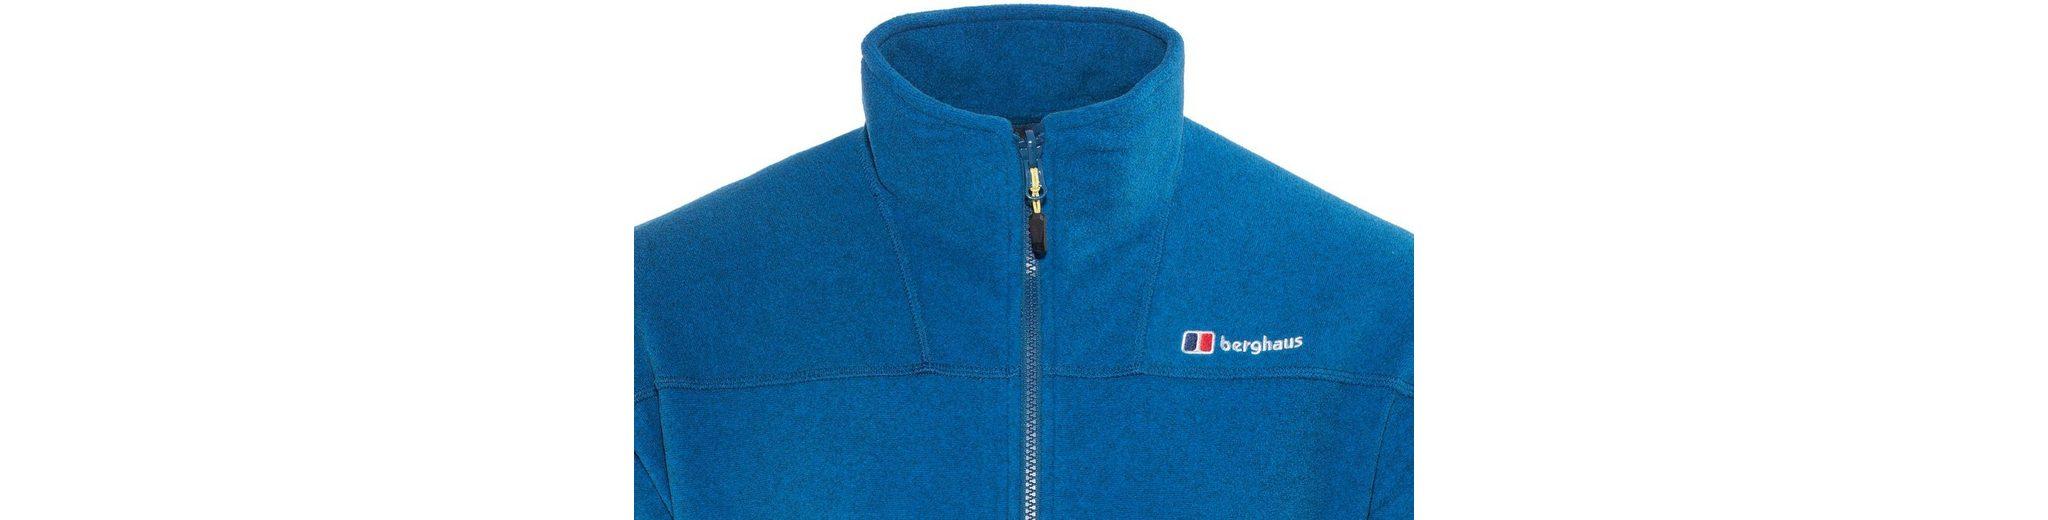 Berghaus Outdoorjacke Spectrum Micro 2.0 Jacket Men Neuesten Kollektionen Günstig Online 7INnP